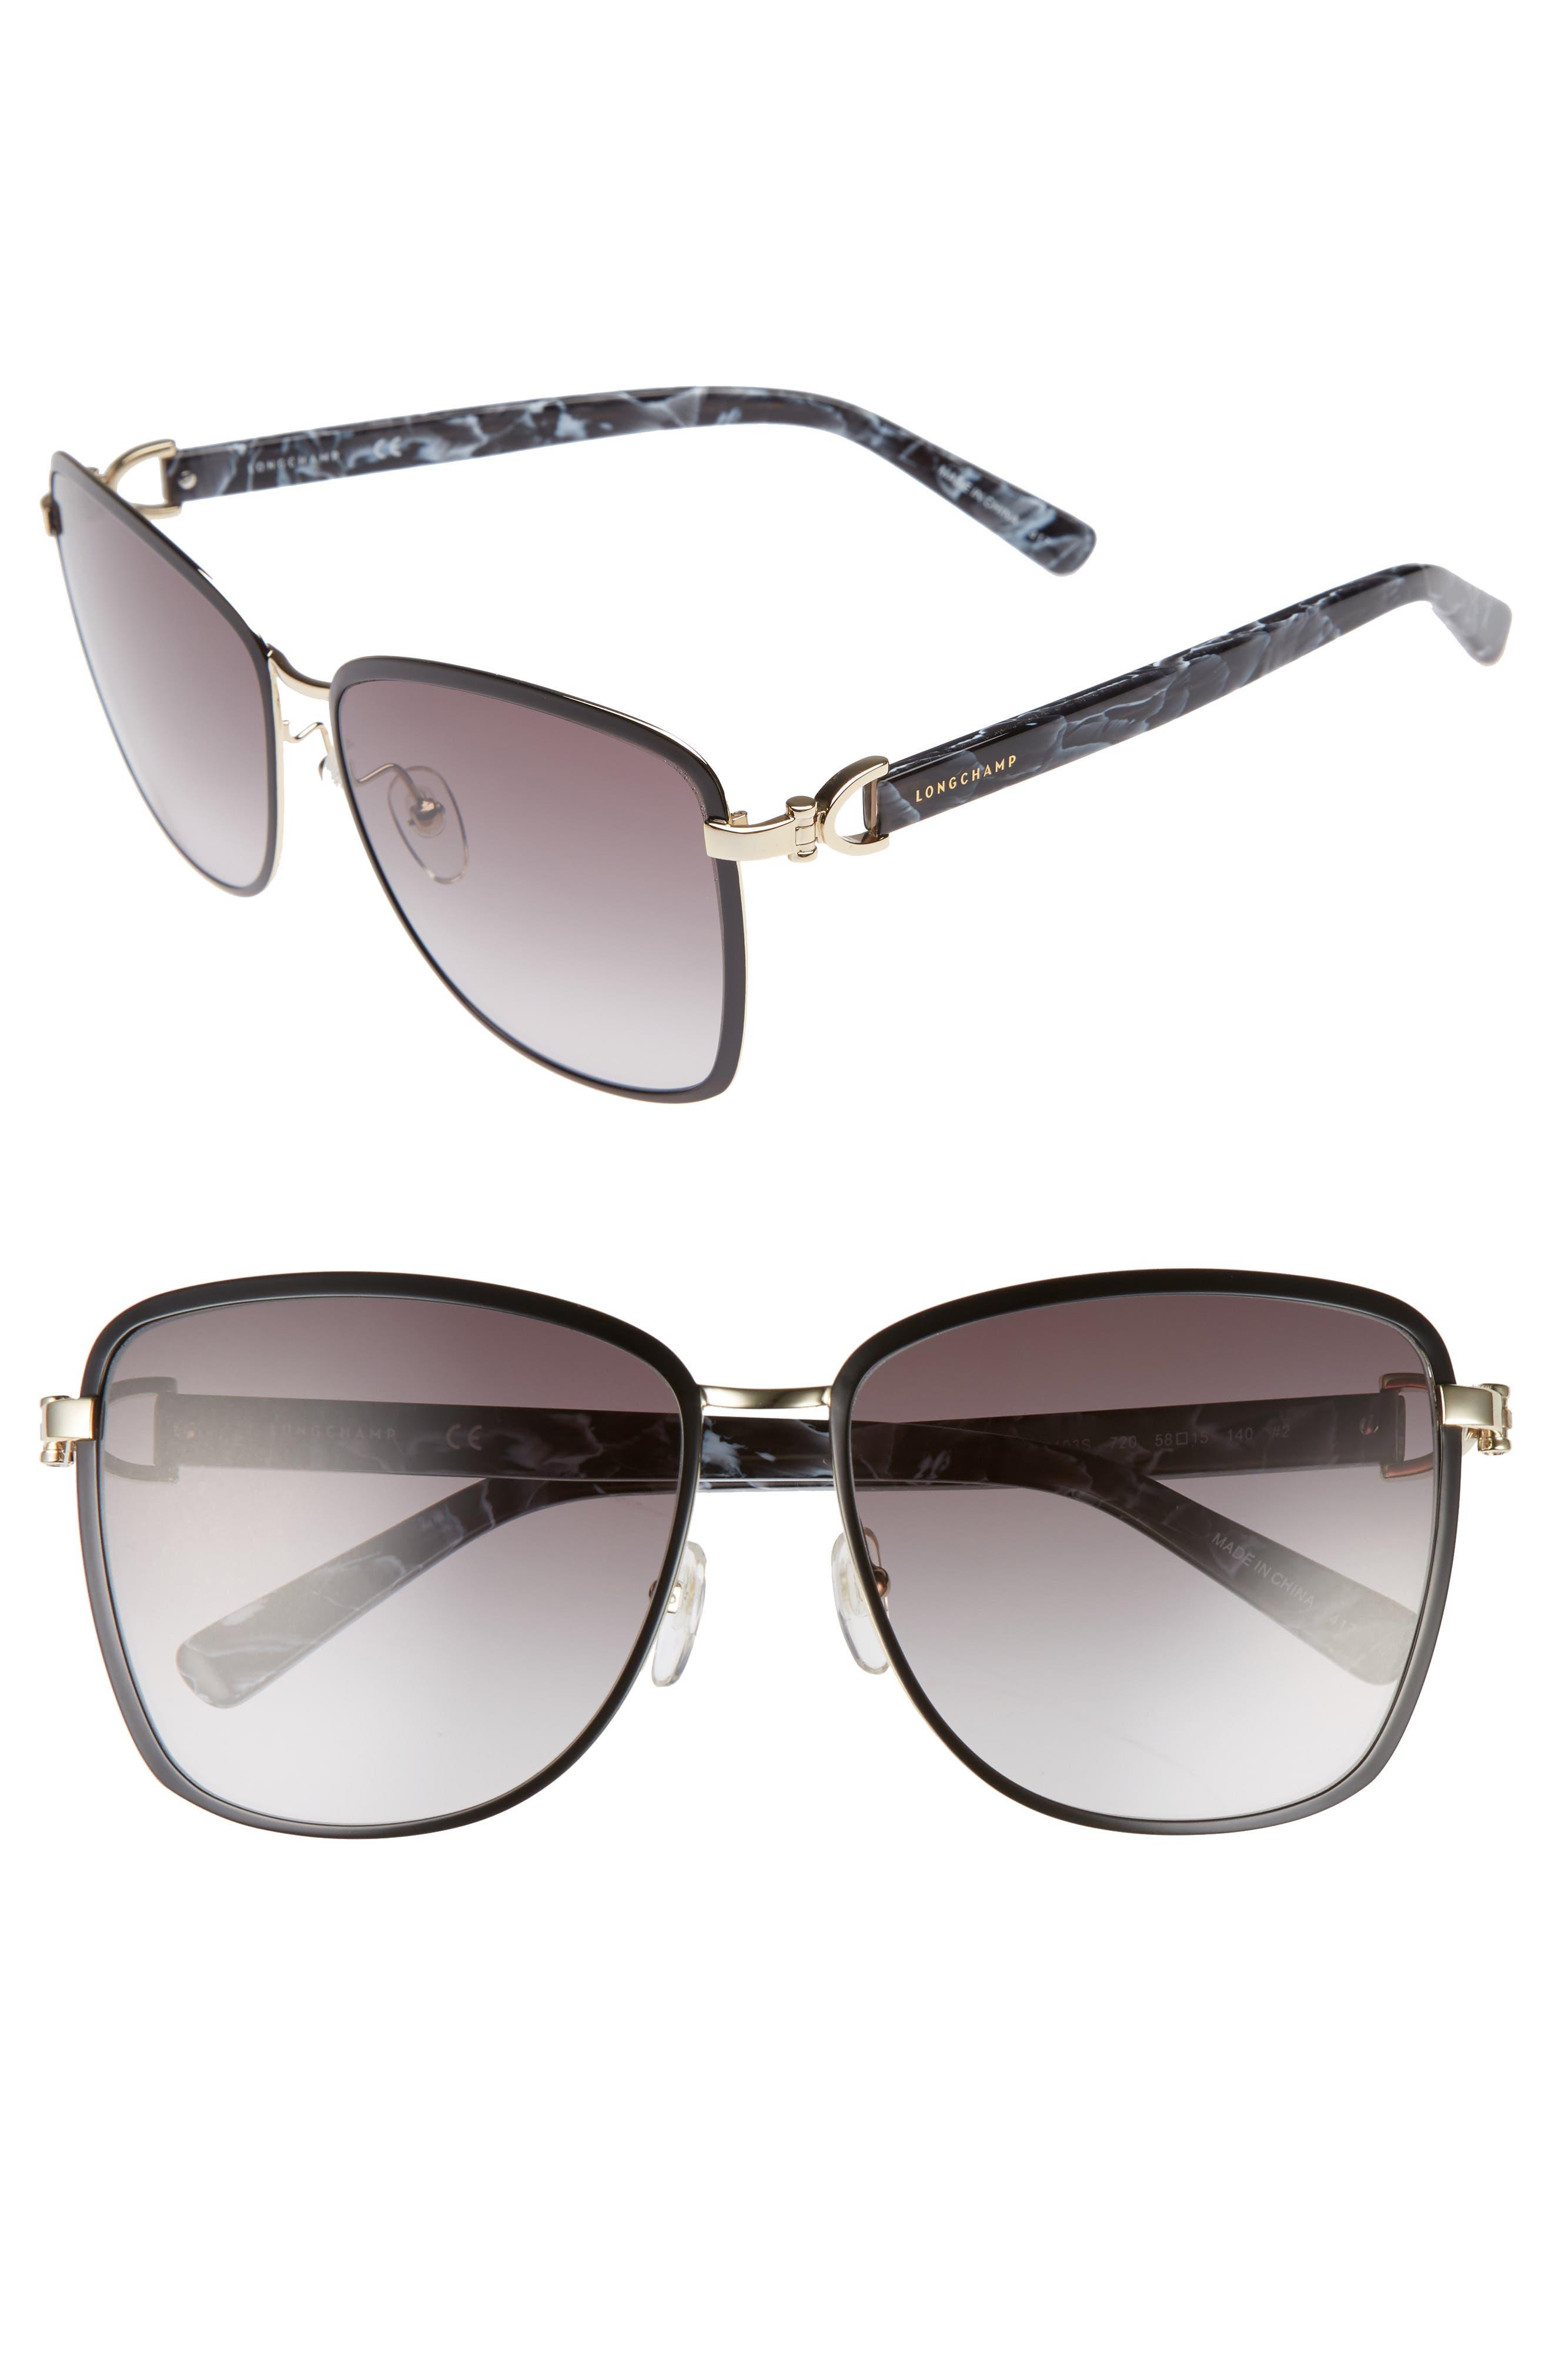 58mm Metal Sunglasses,                             Main thumbnail 1, color,                             GOLD/ BLACK